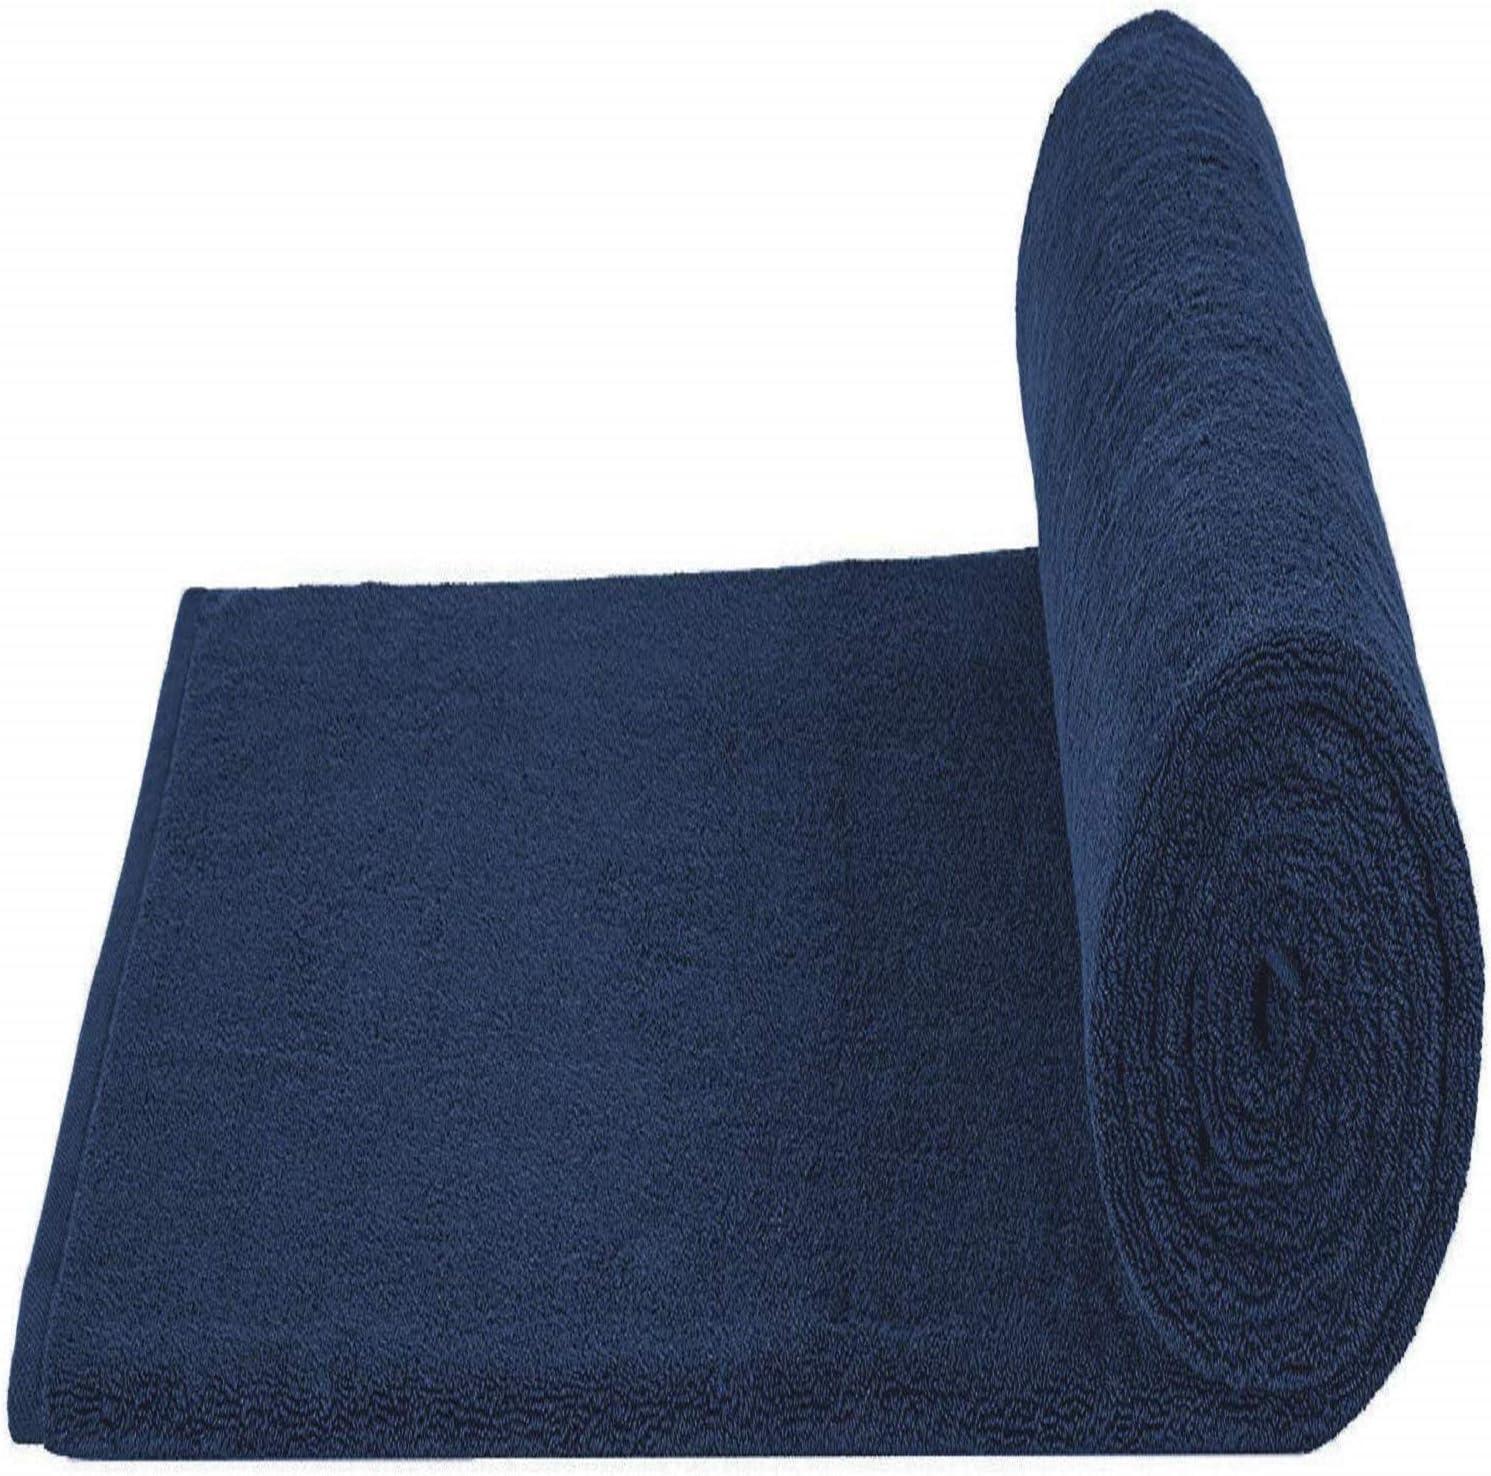 JTYJIN Bath Towel 140x70cm Microfibre Beach Towel Thick Bath Towels Soft Super Aborsbent Sport Gym Fast Drying Cloth